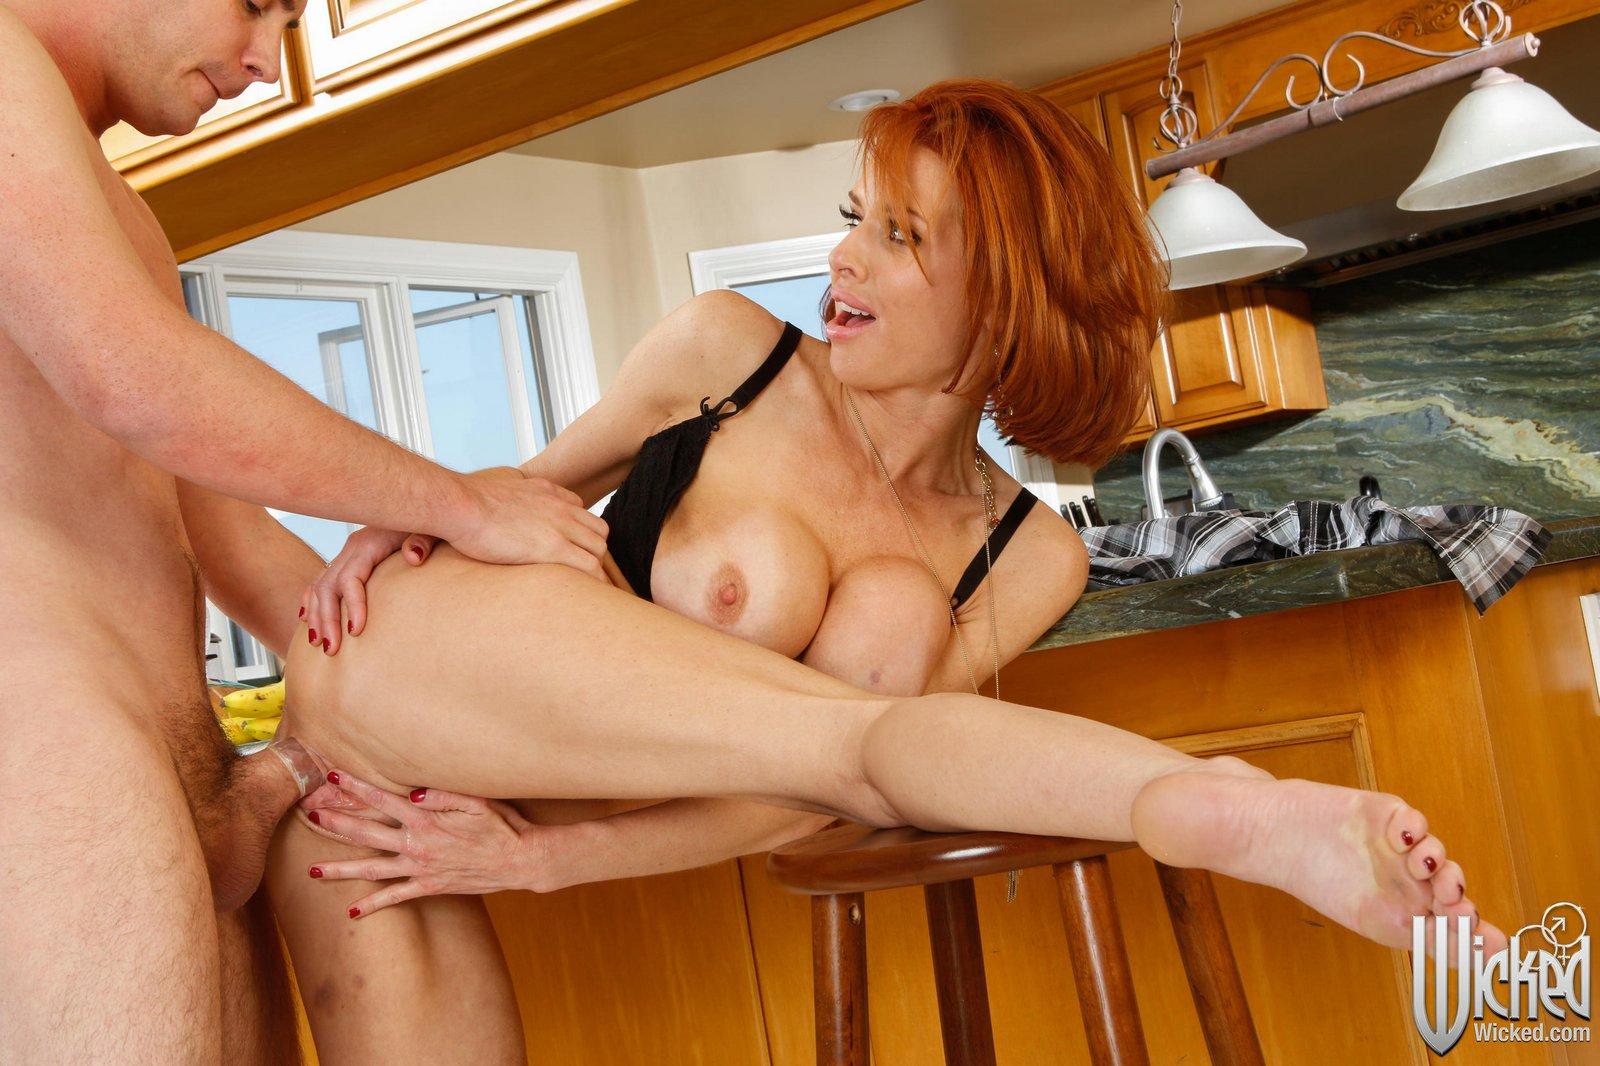 Chubby redhead mommy